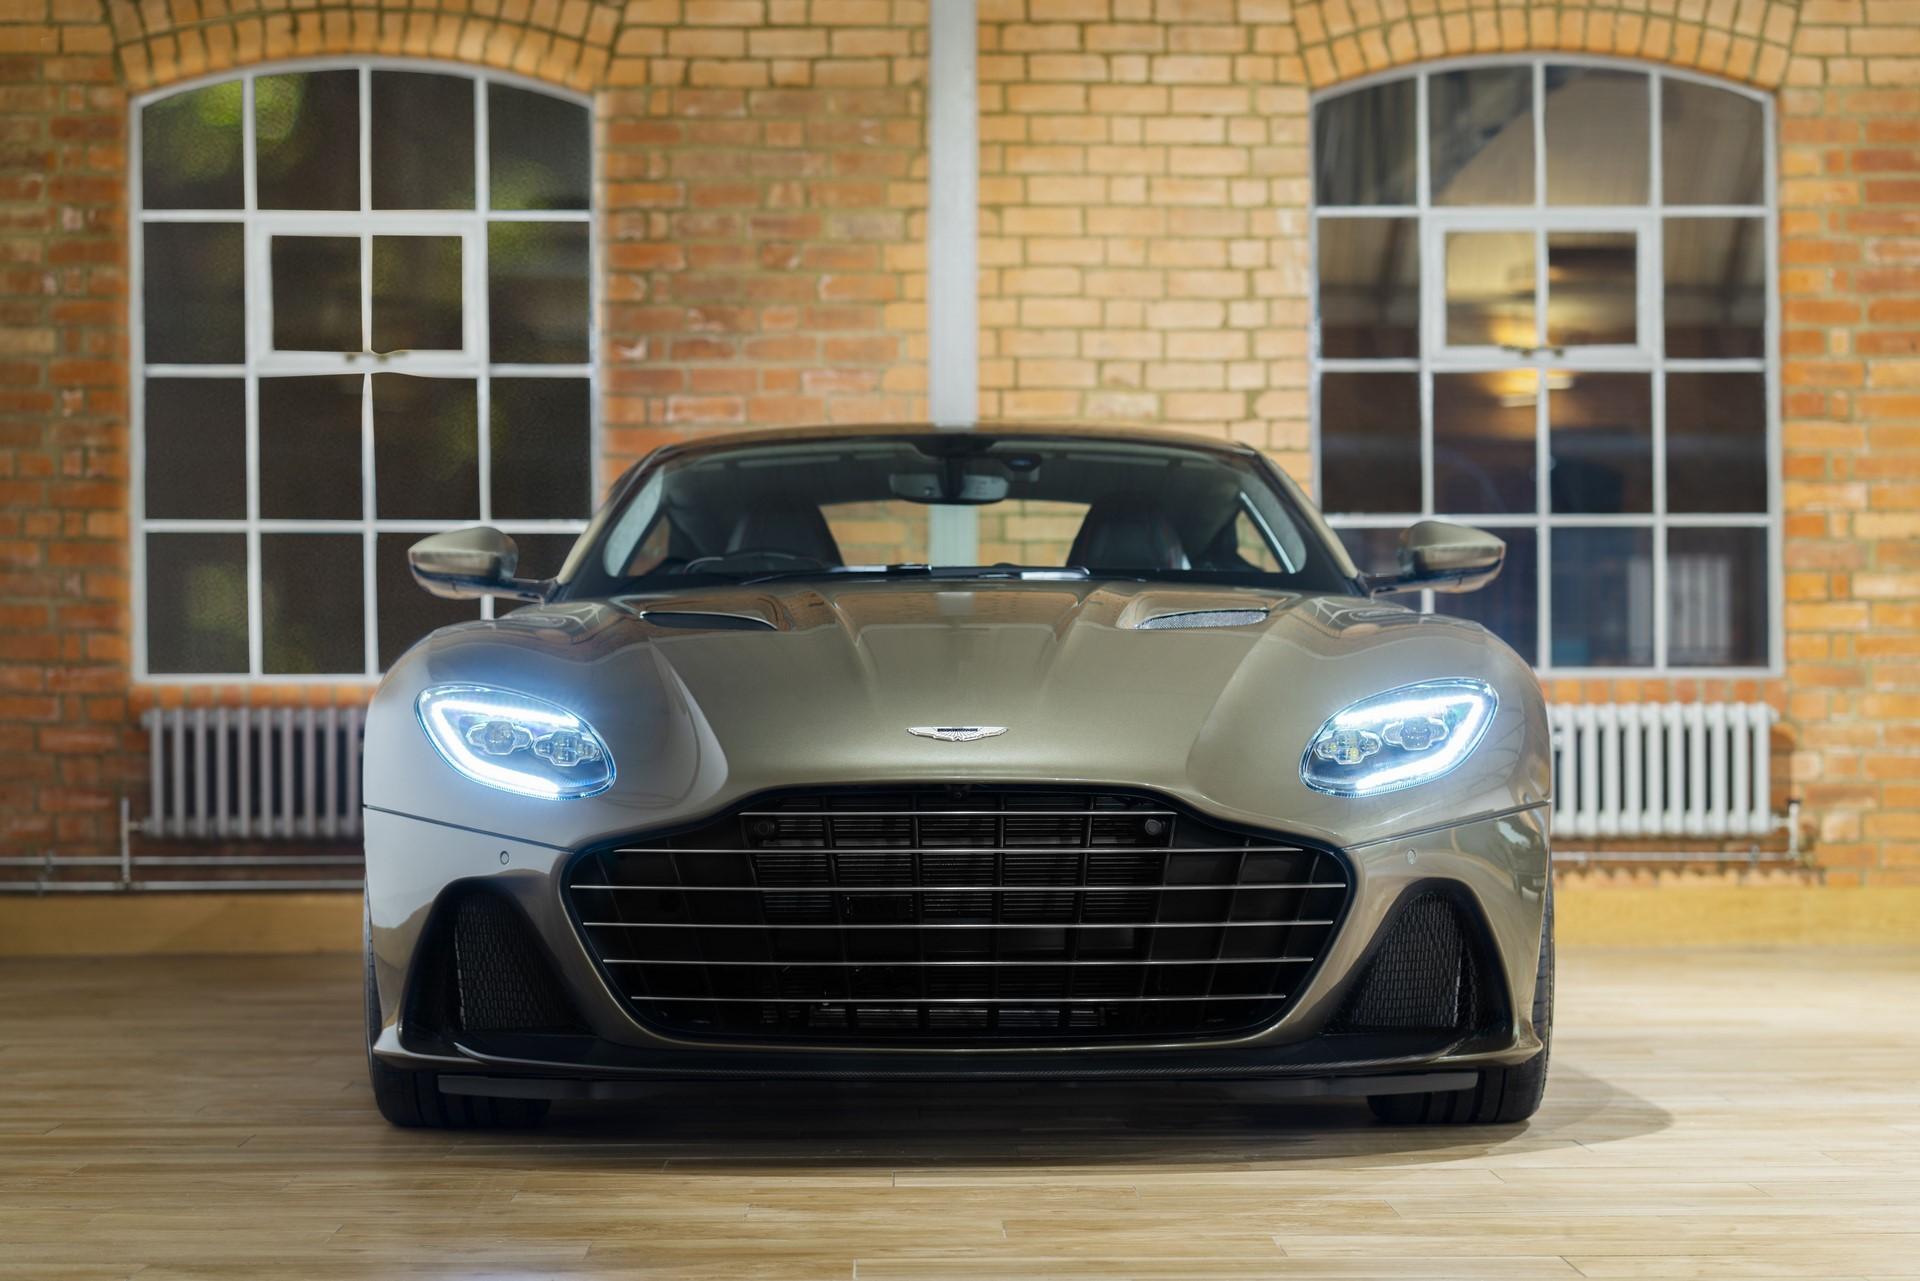 Aston-Martin-DBS-Superleggera-James-Bond-Special-Edition-5